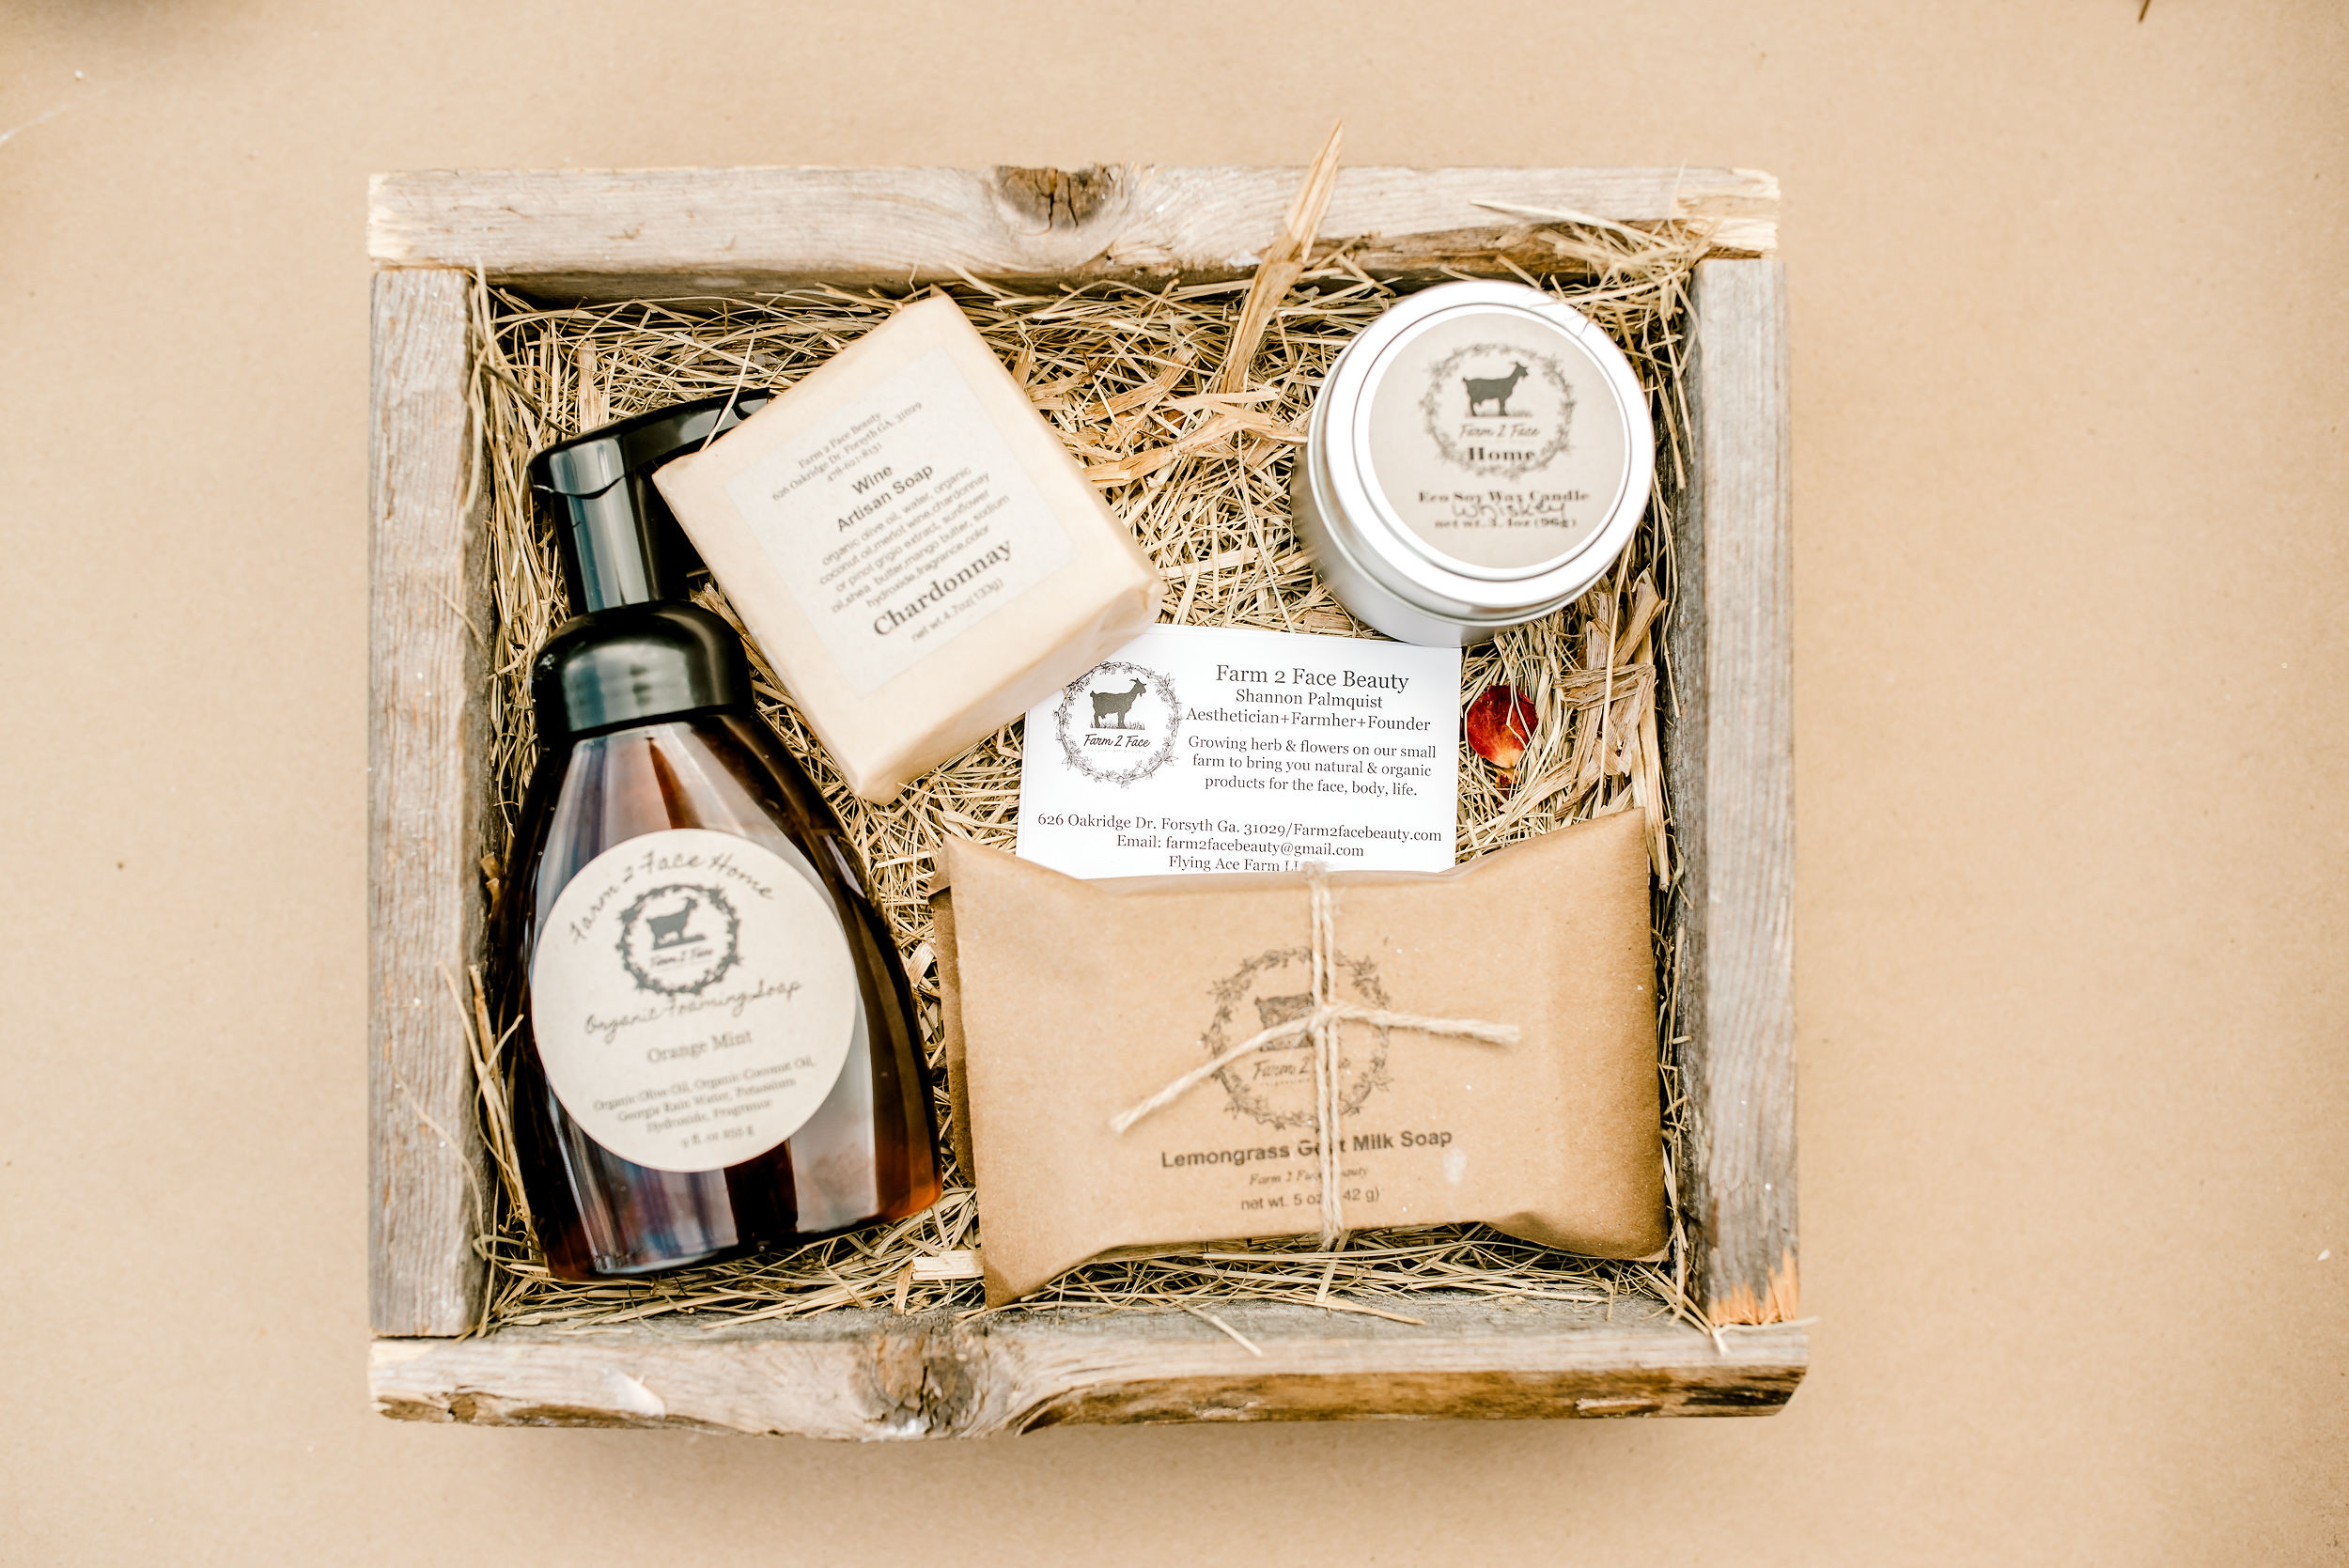 Lots of Goodness - Natural & Organic